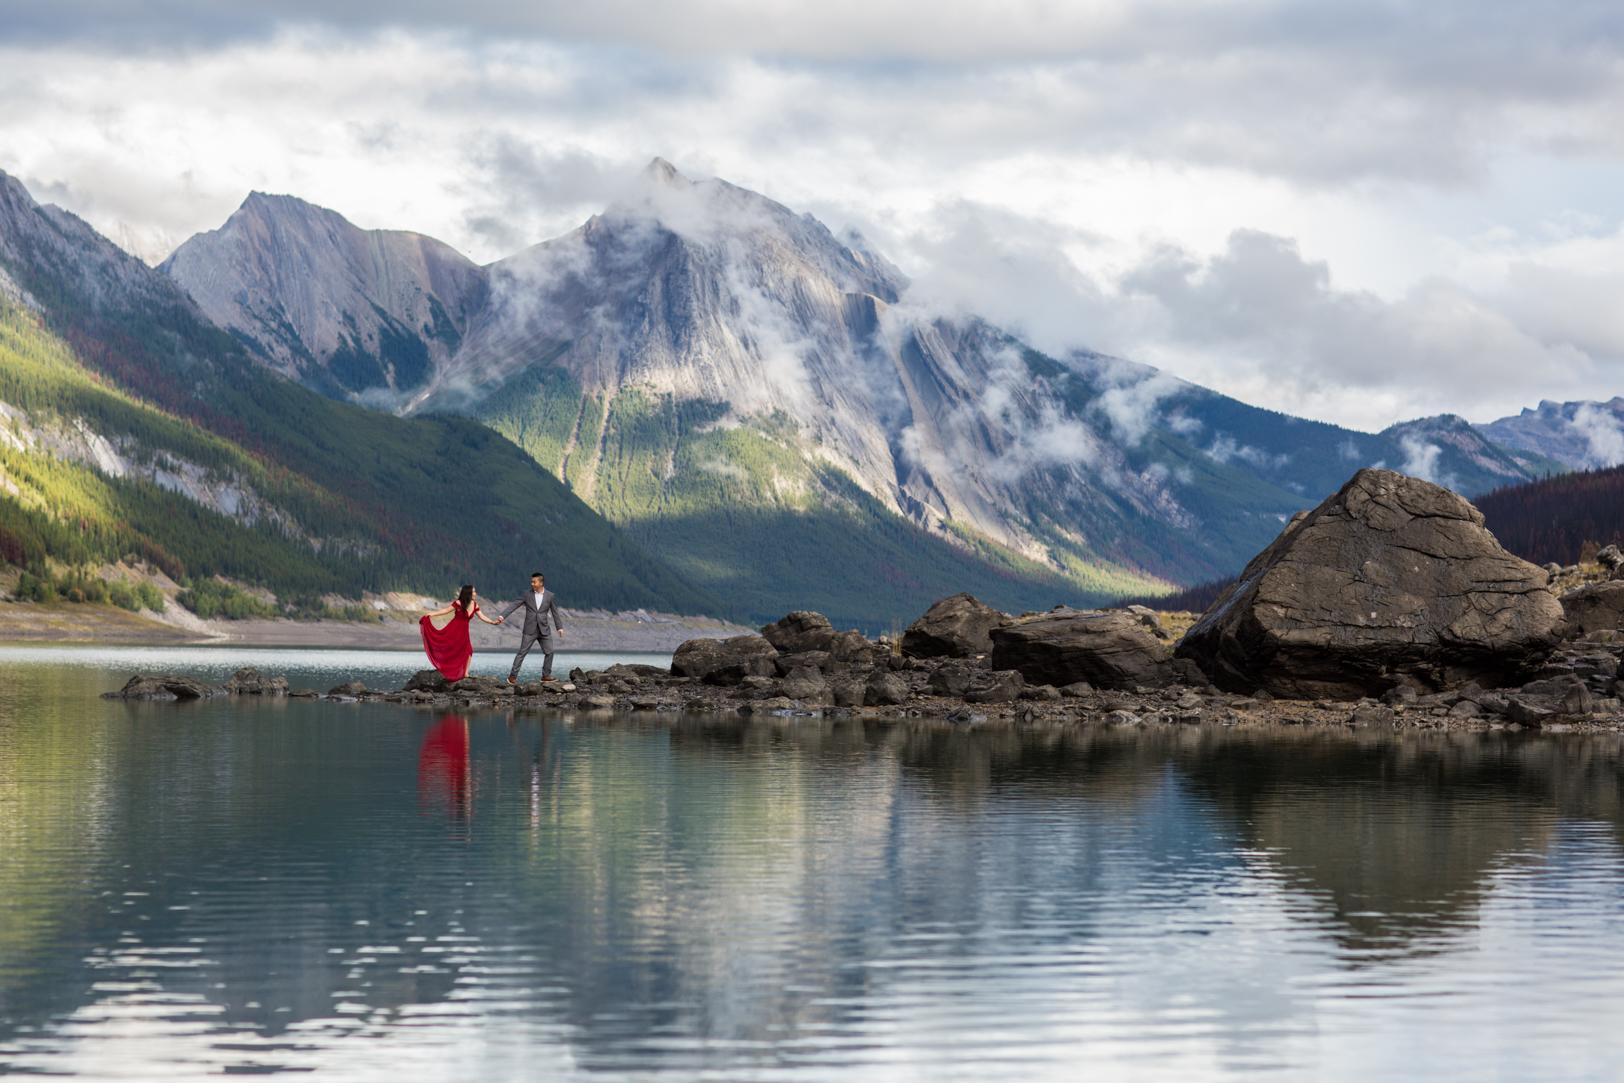 Epic Mountain Engagement Photos in Jasper